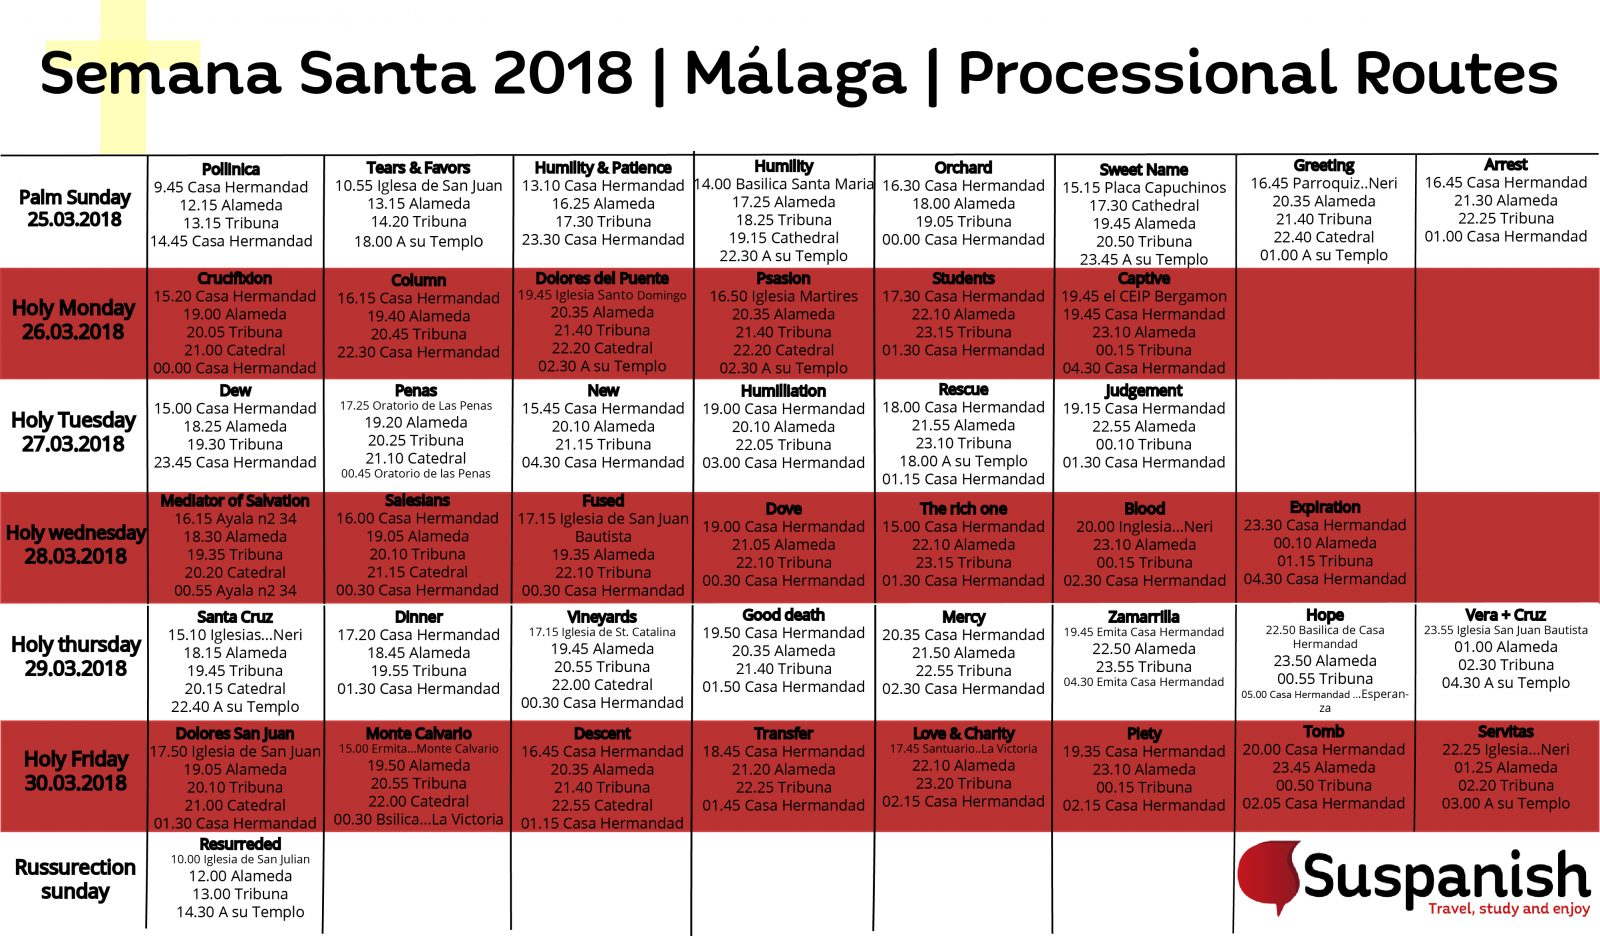 Semana Santa schedule 2018 Málaga